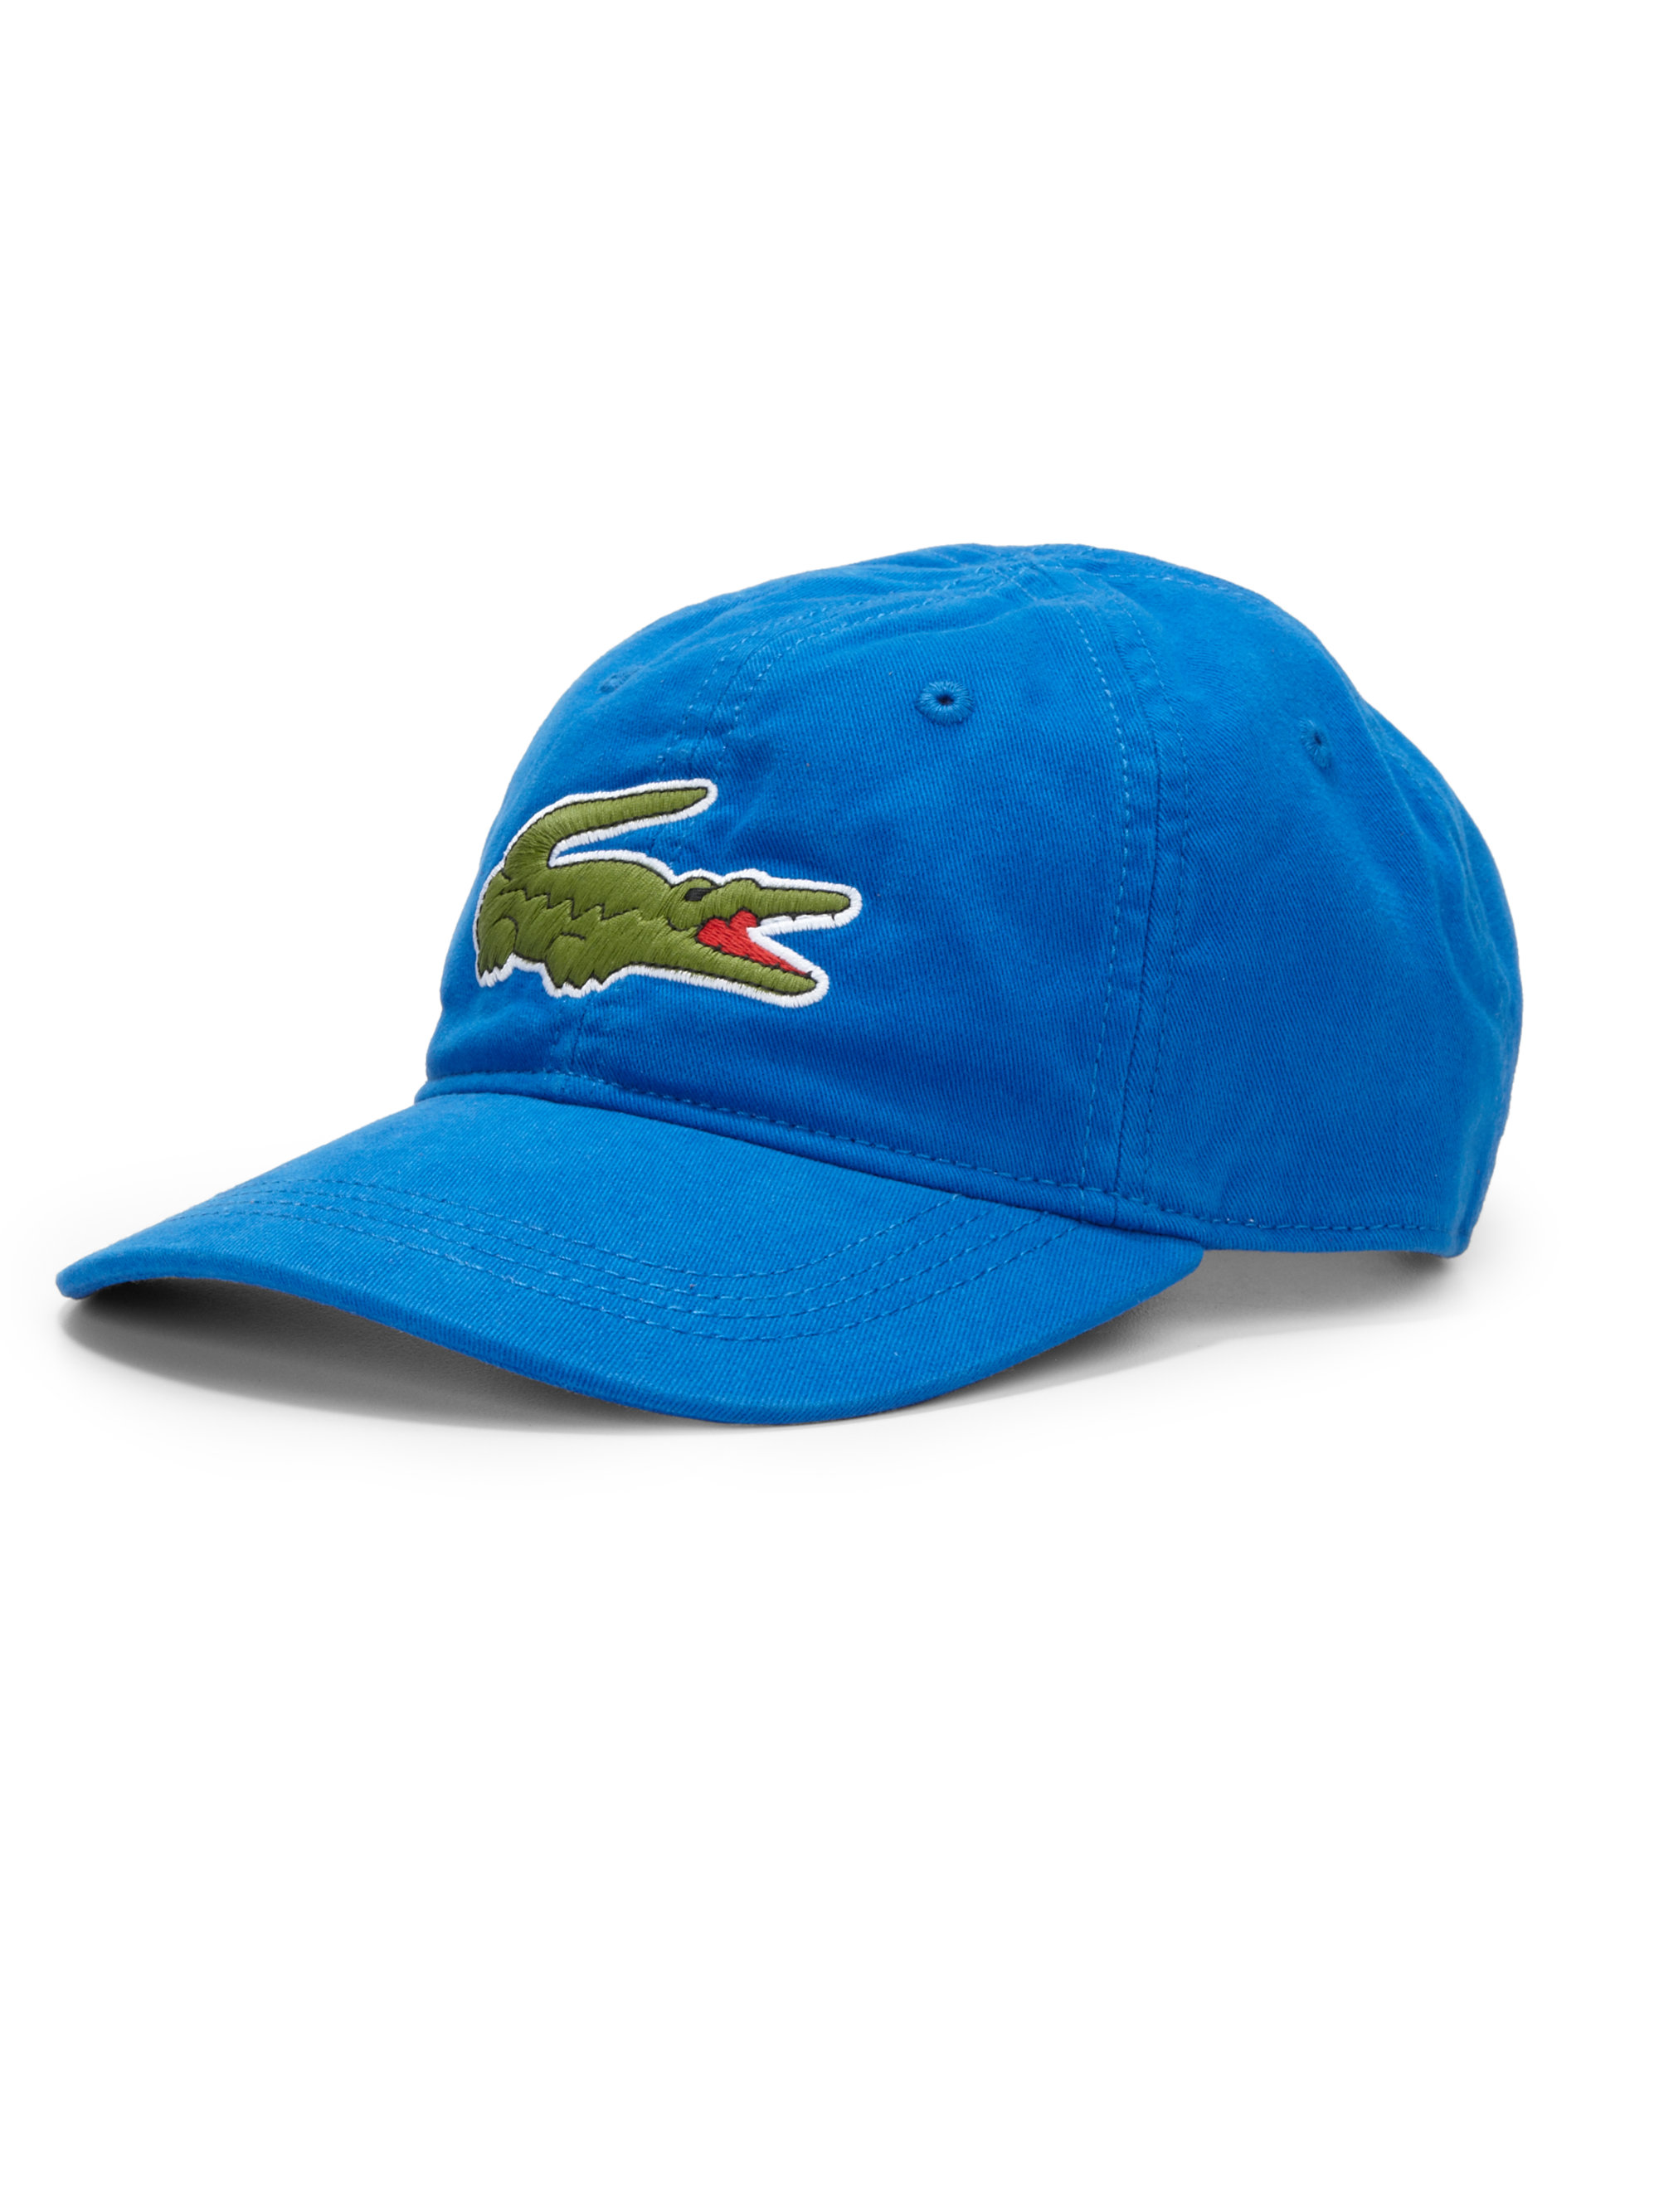 34558e3a515 ... Lyst - Lacoste Cotton Baseball Cap in Blue for Men store d79ab 14ac8 ...